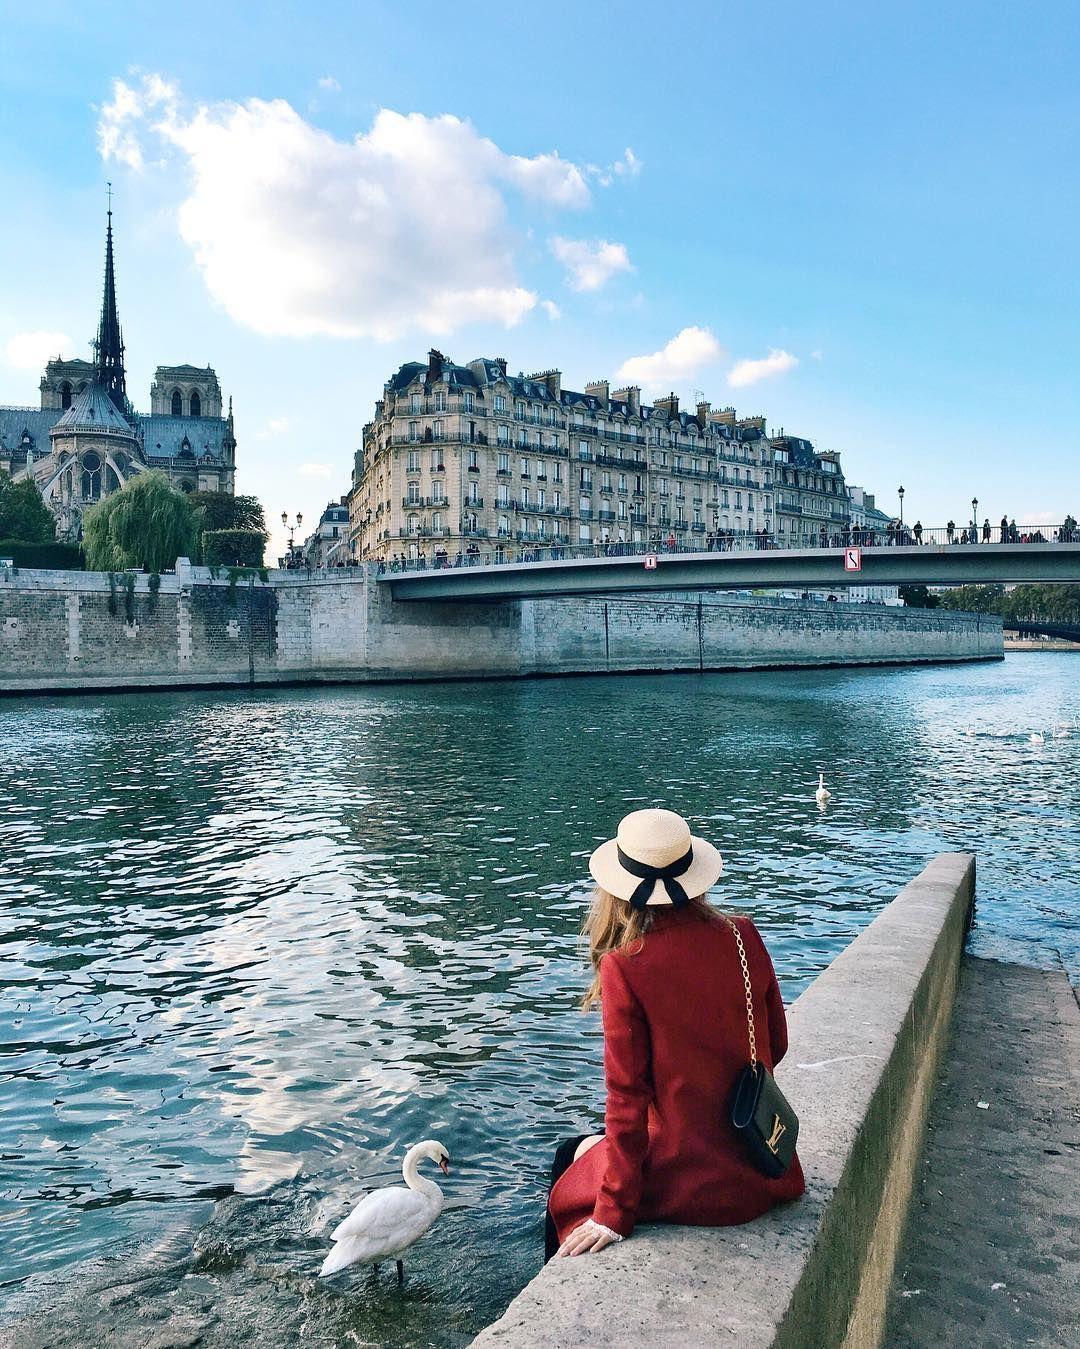 7 448 Likes 80 Comments Jenny Cipoletti Margoandme On Instagram Meet My New Friend Sally The Swan We Hang Out On Su Paris Jenny Cipoletti Paris Travel